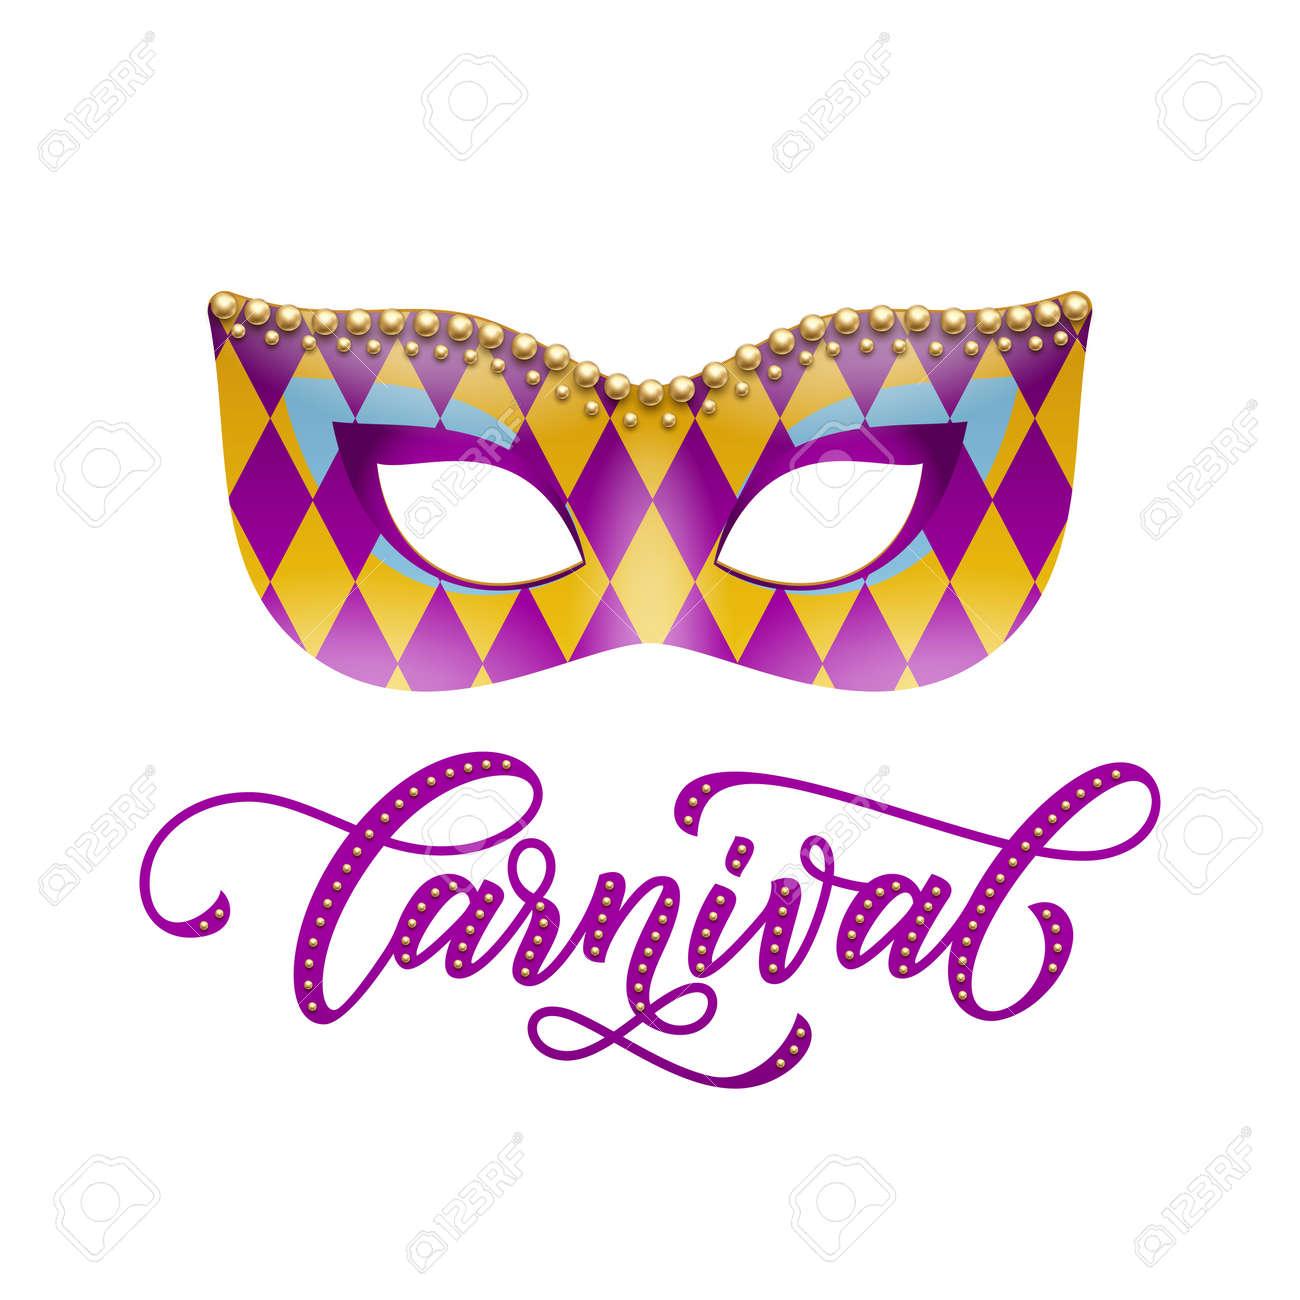 Masque Mardi Gras Avec Motif Arlequin Et Perles Dor Décoration